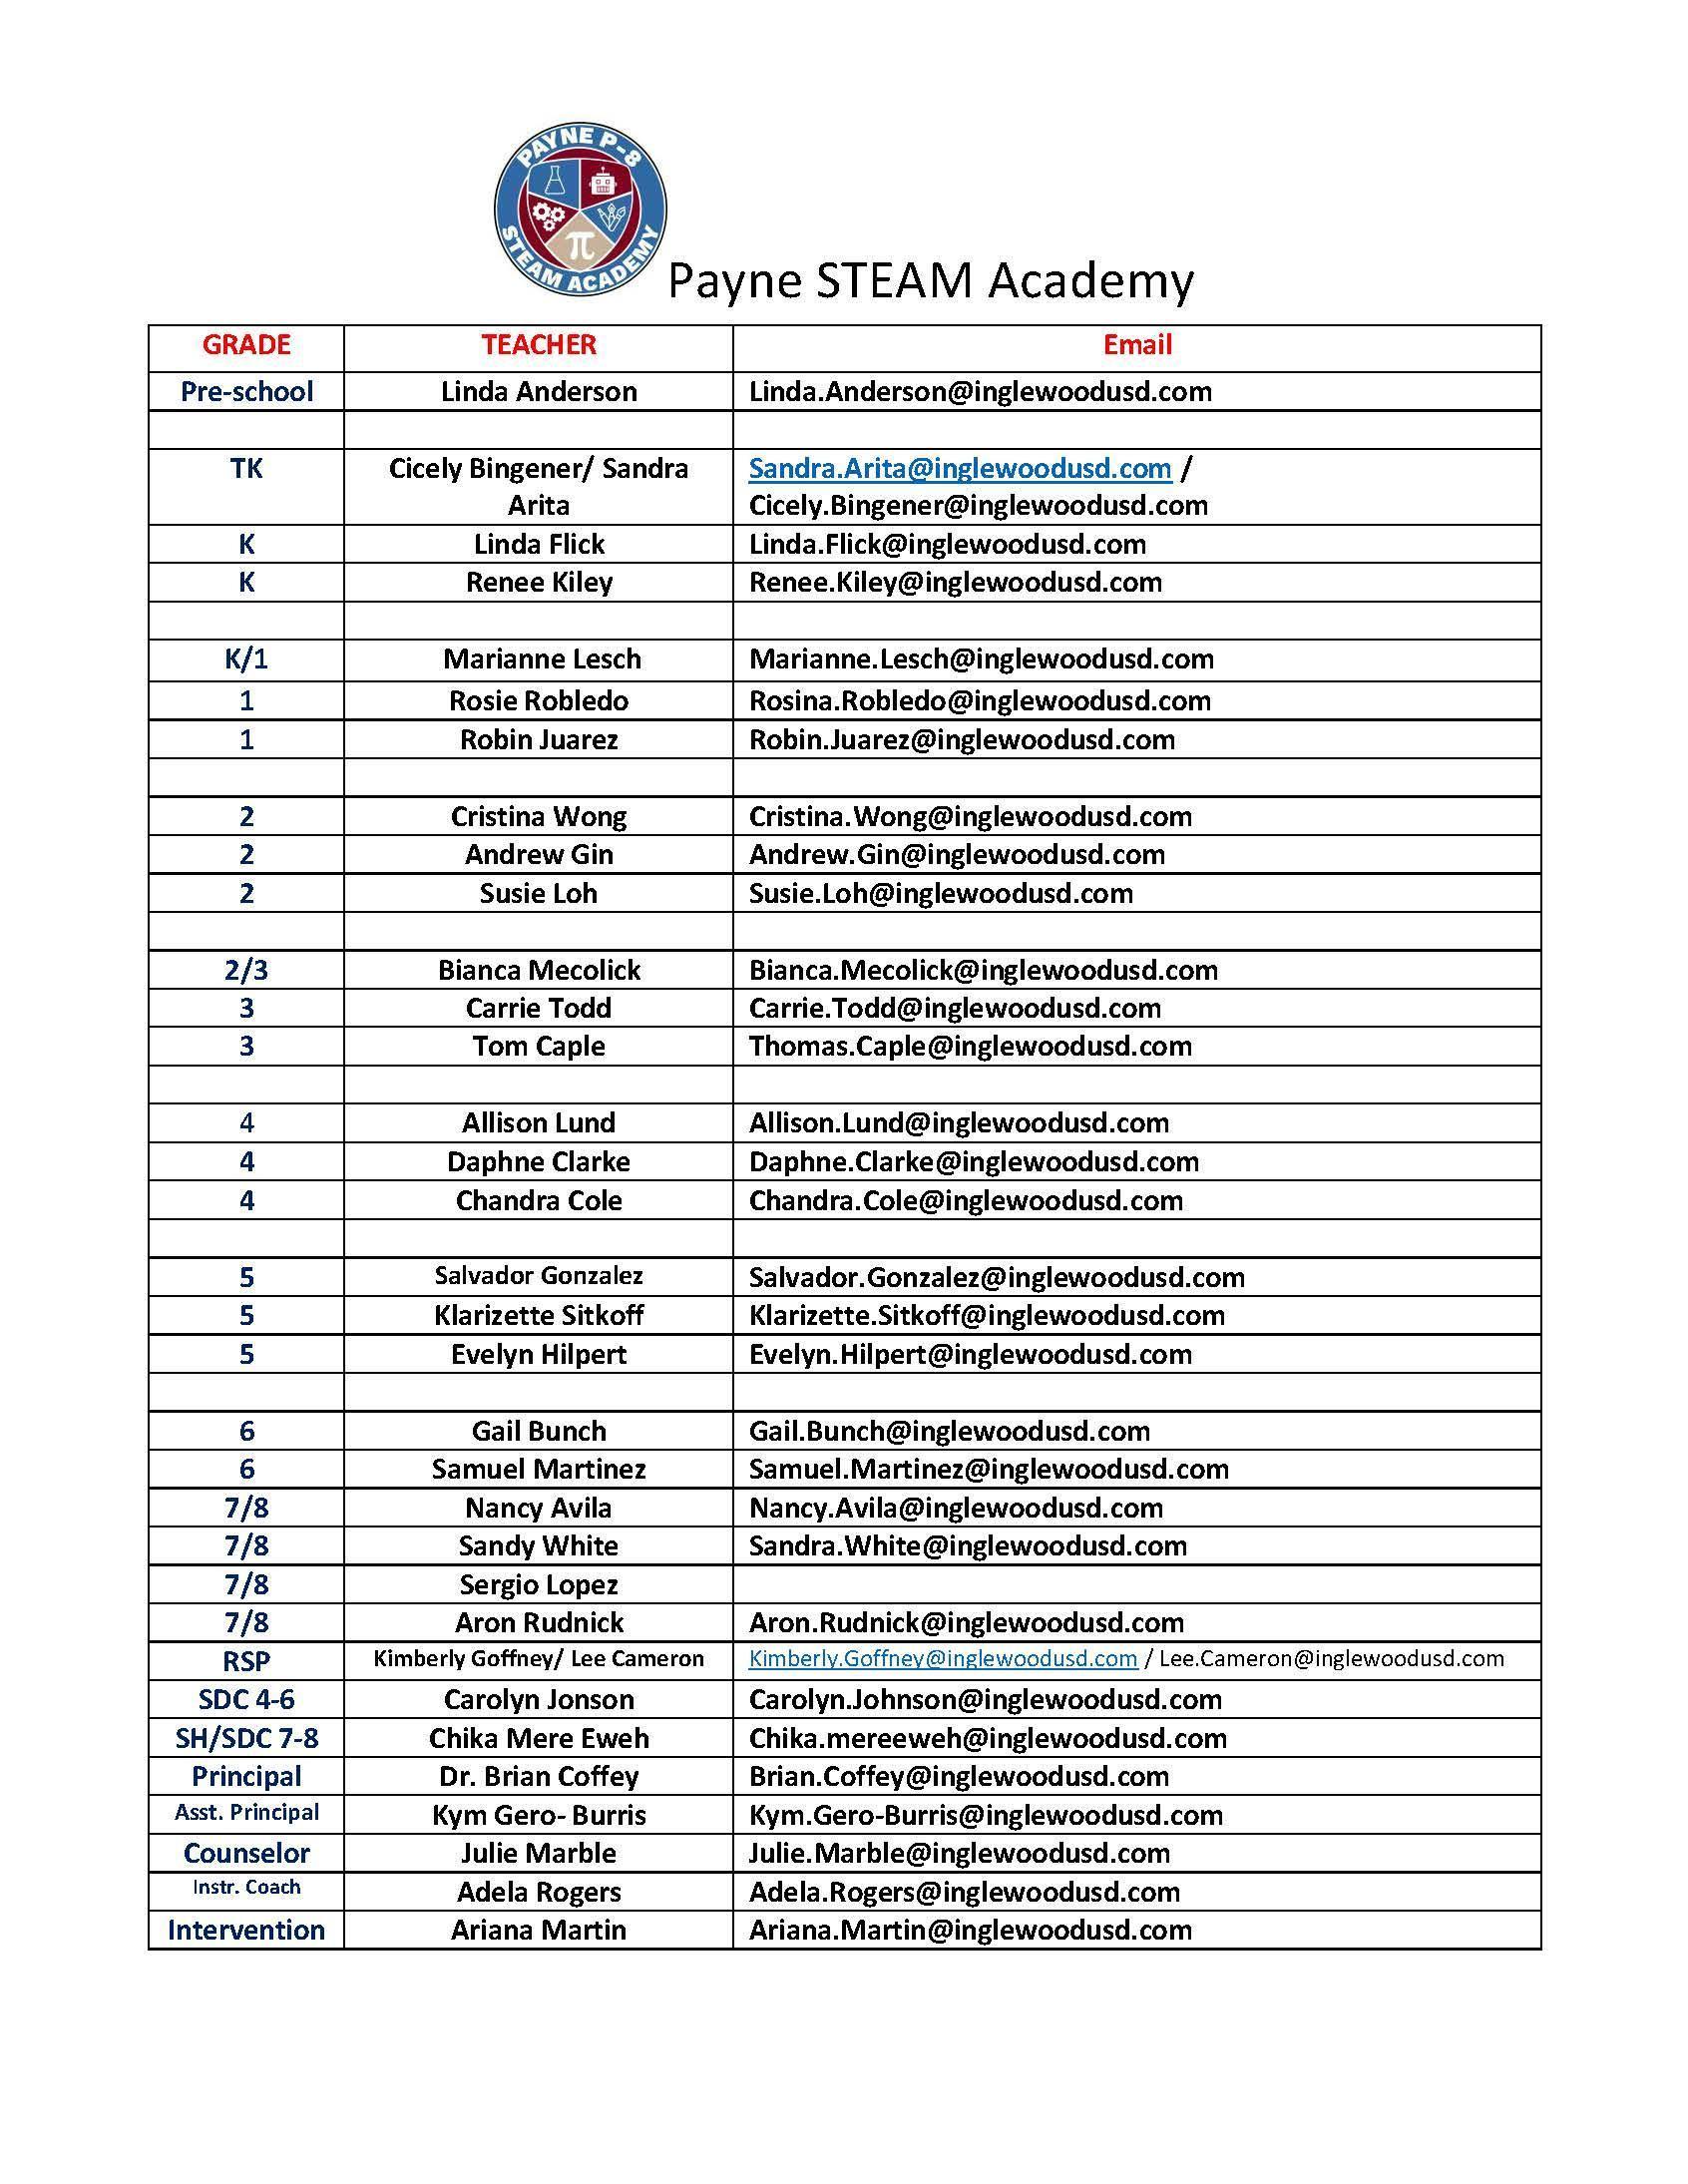 staff roster